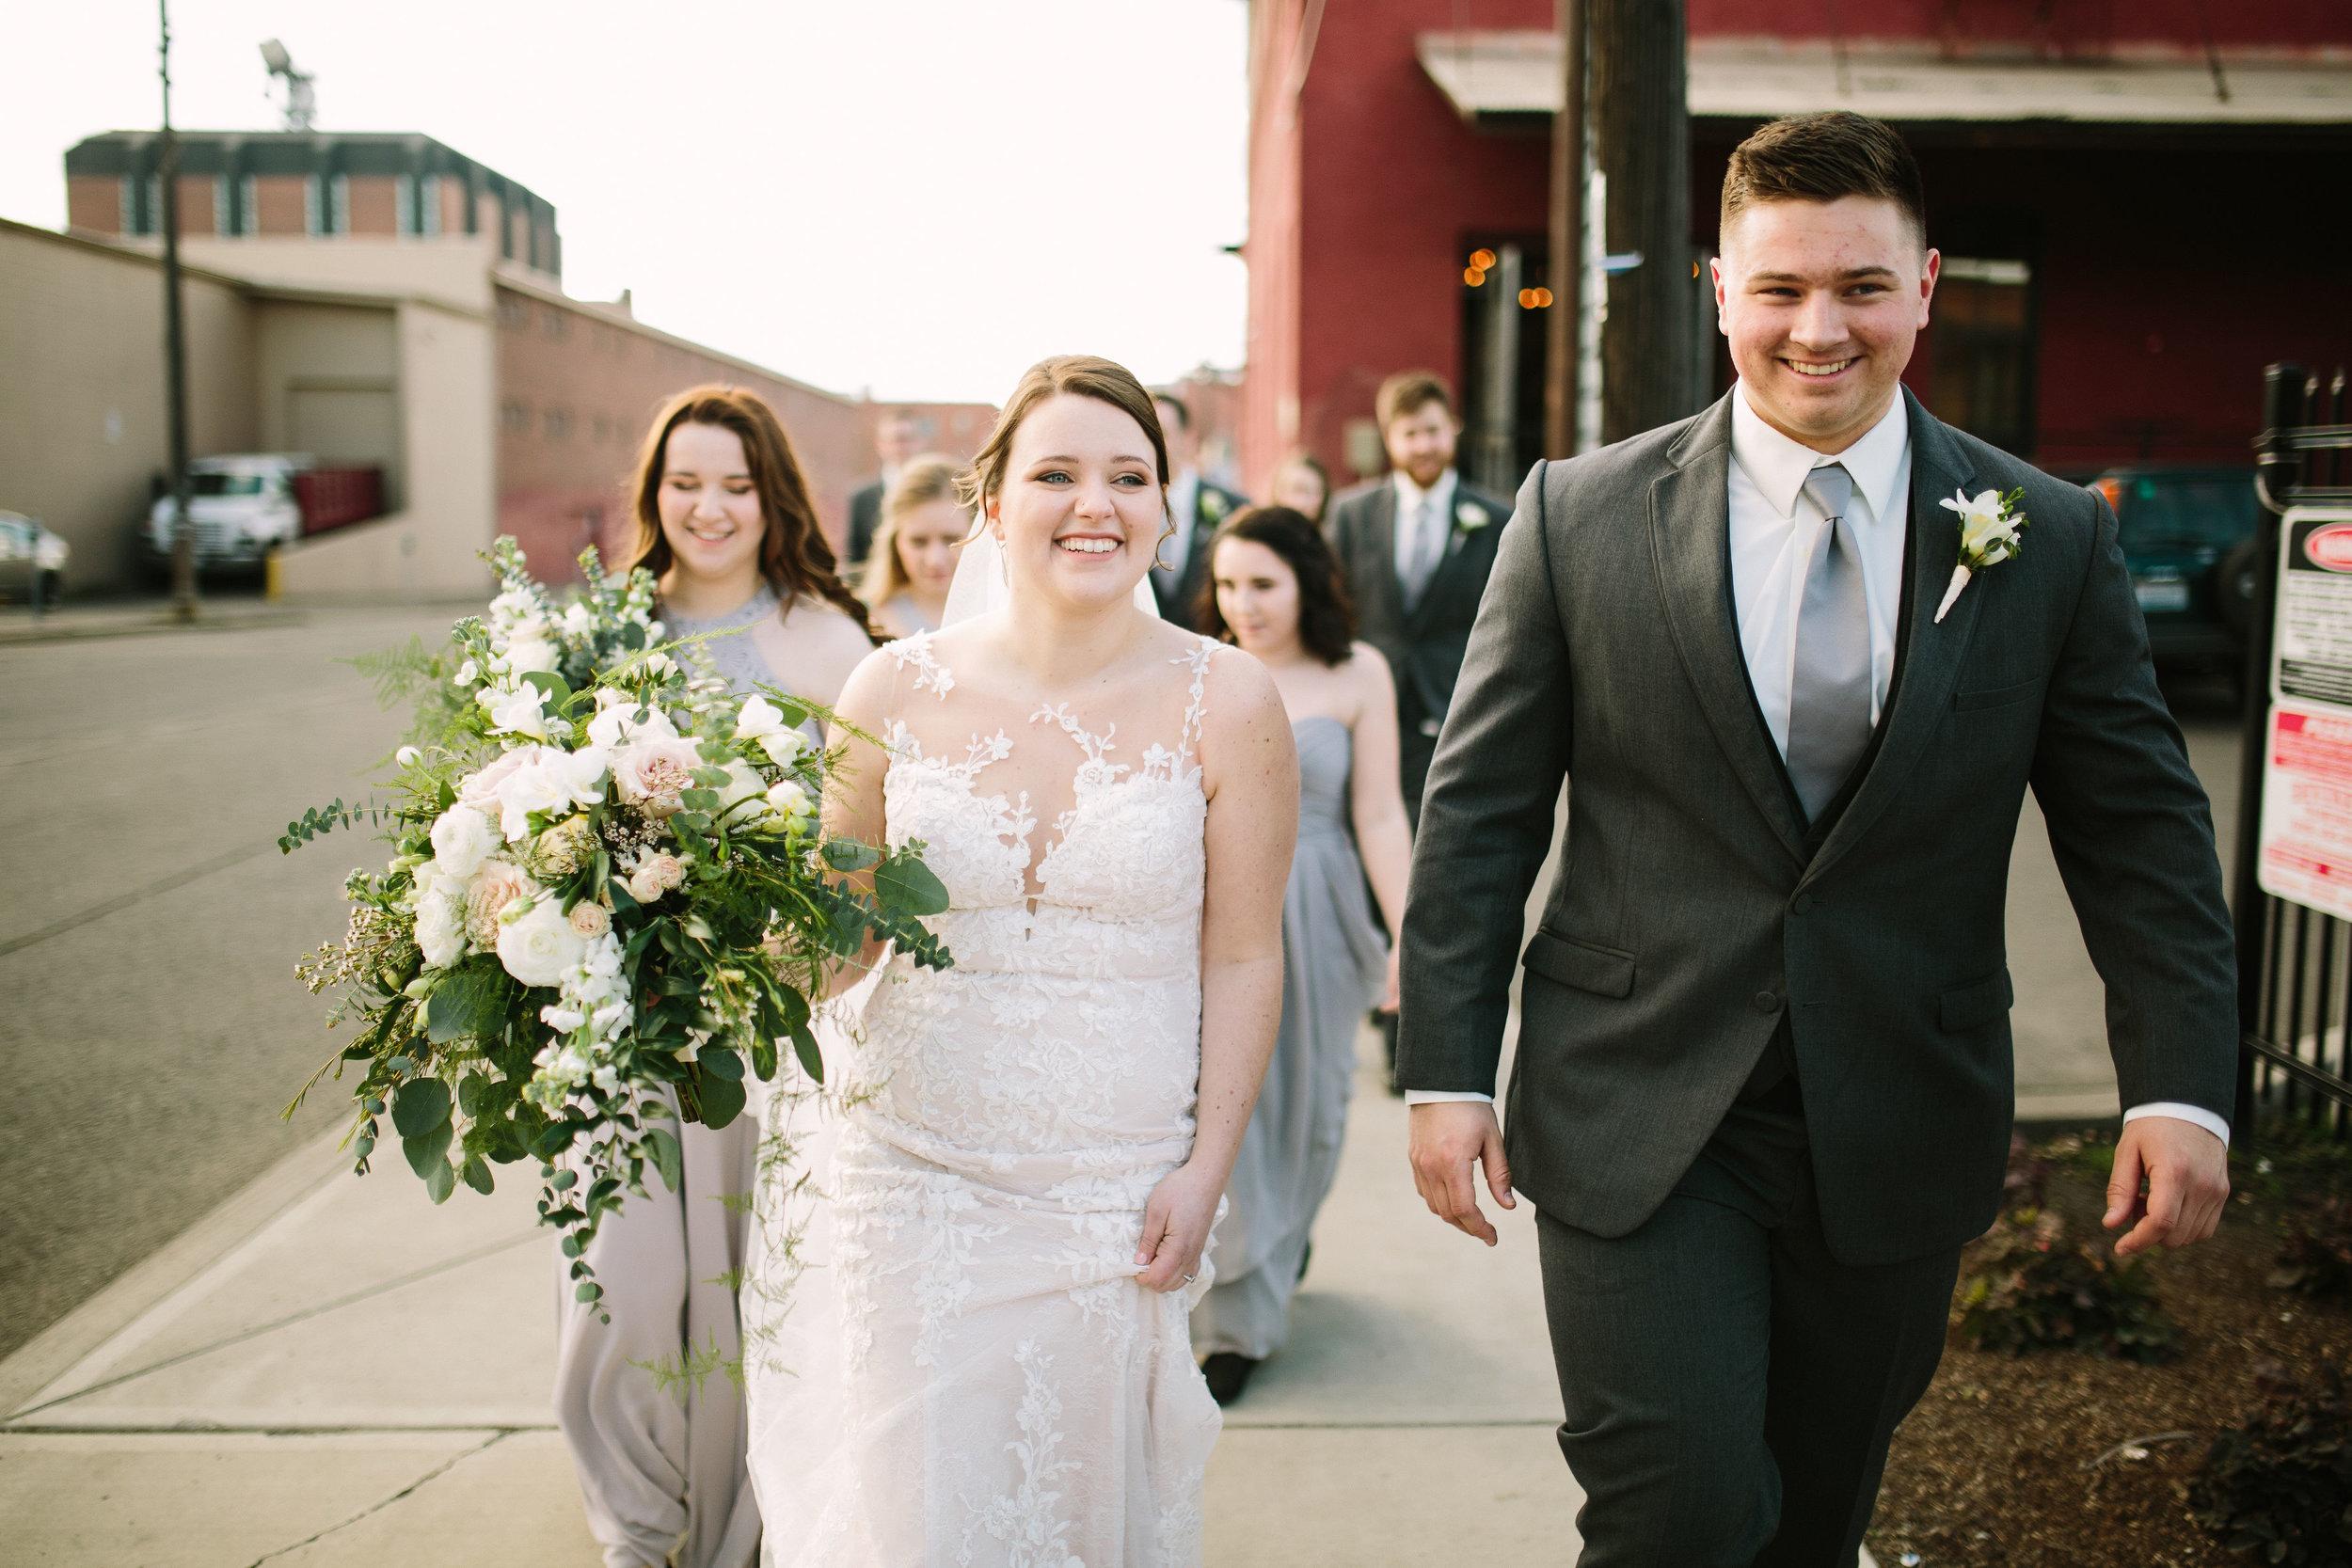 Fun Rustic spokane wedding bridal party walking together happy